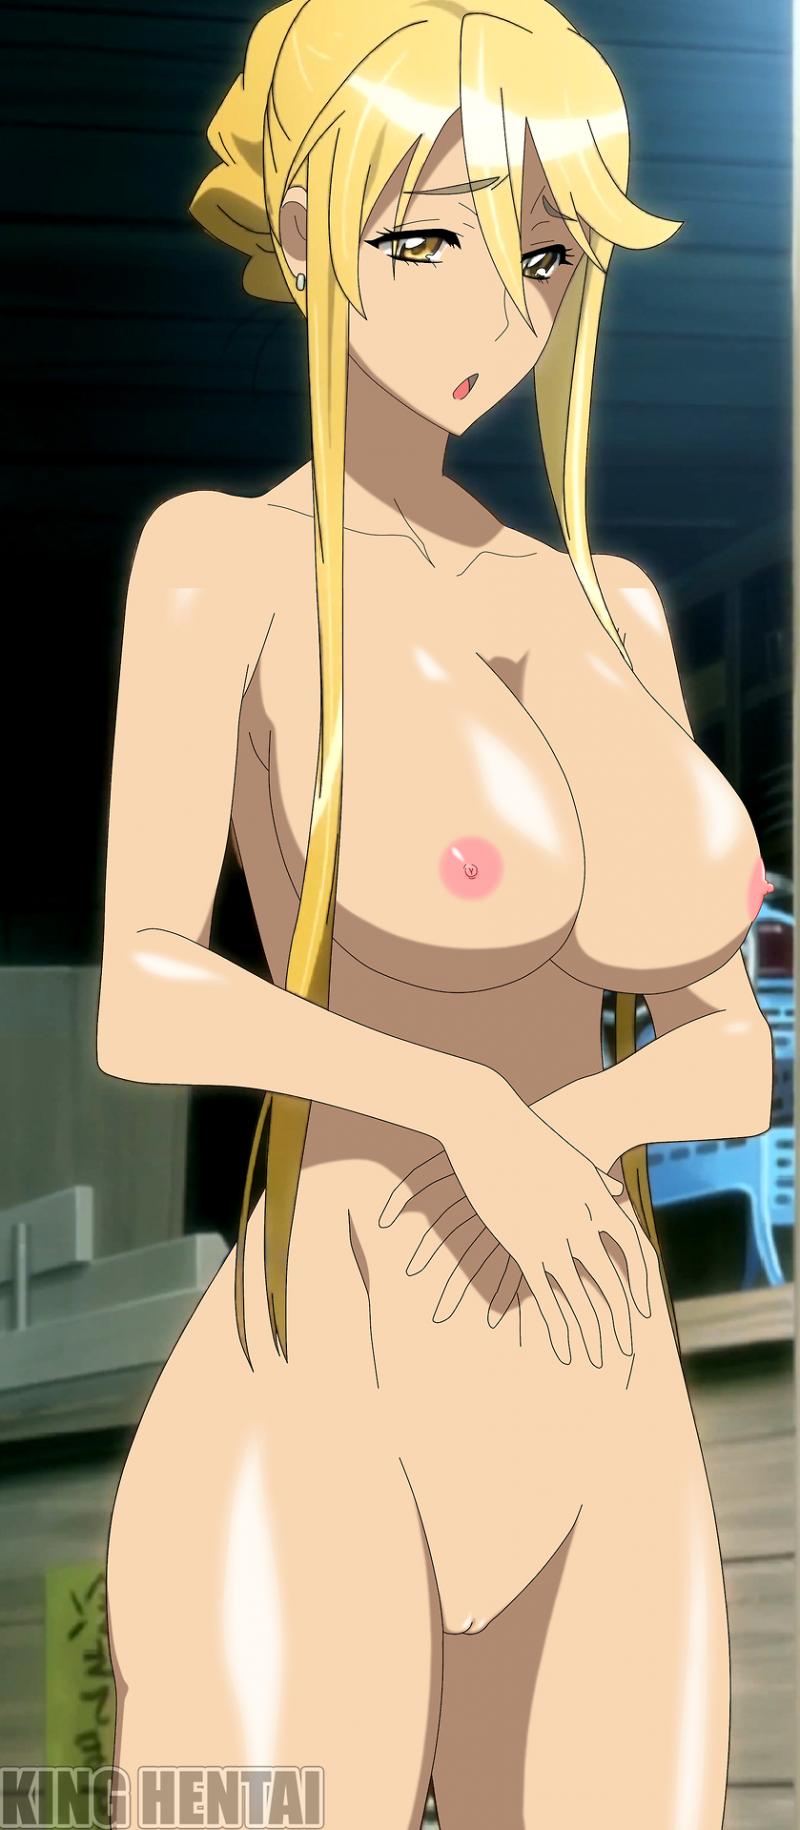 Shizuka Marikawa 1391032 - Highschool_of_the_Dead KING-Hentai Shizuka_Marikawa.png